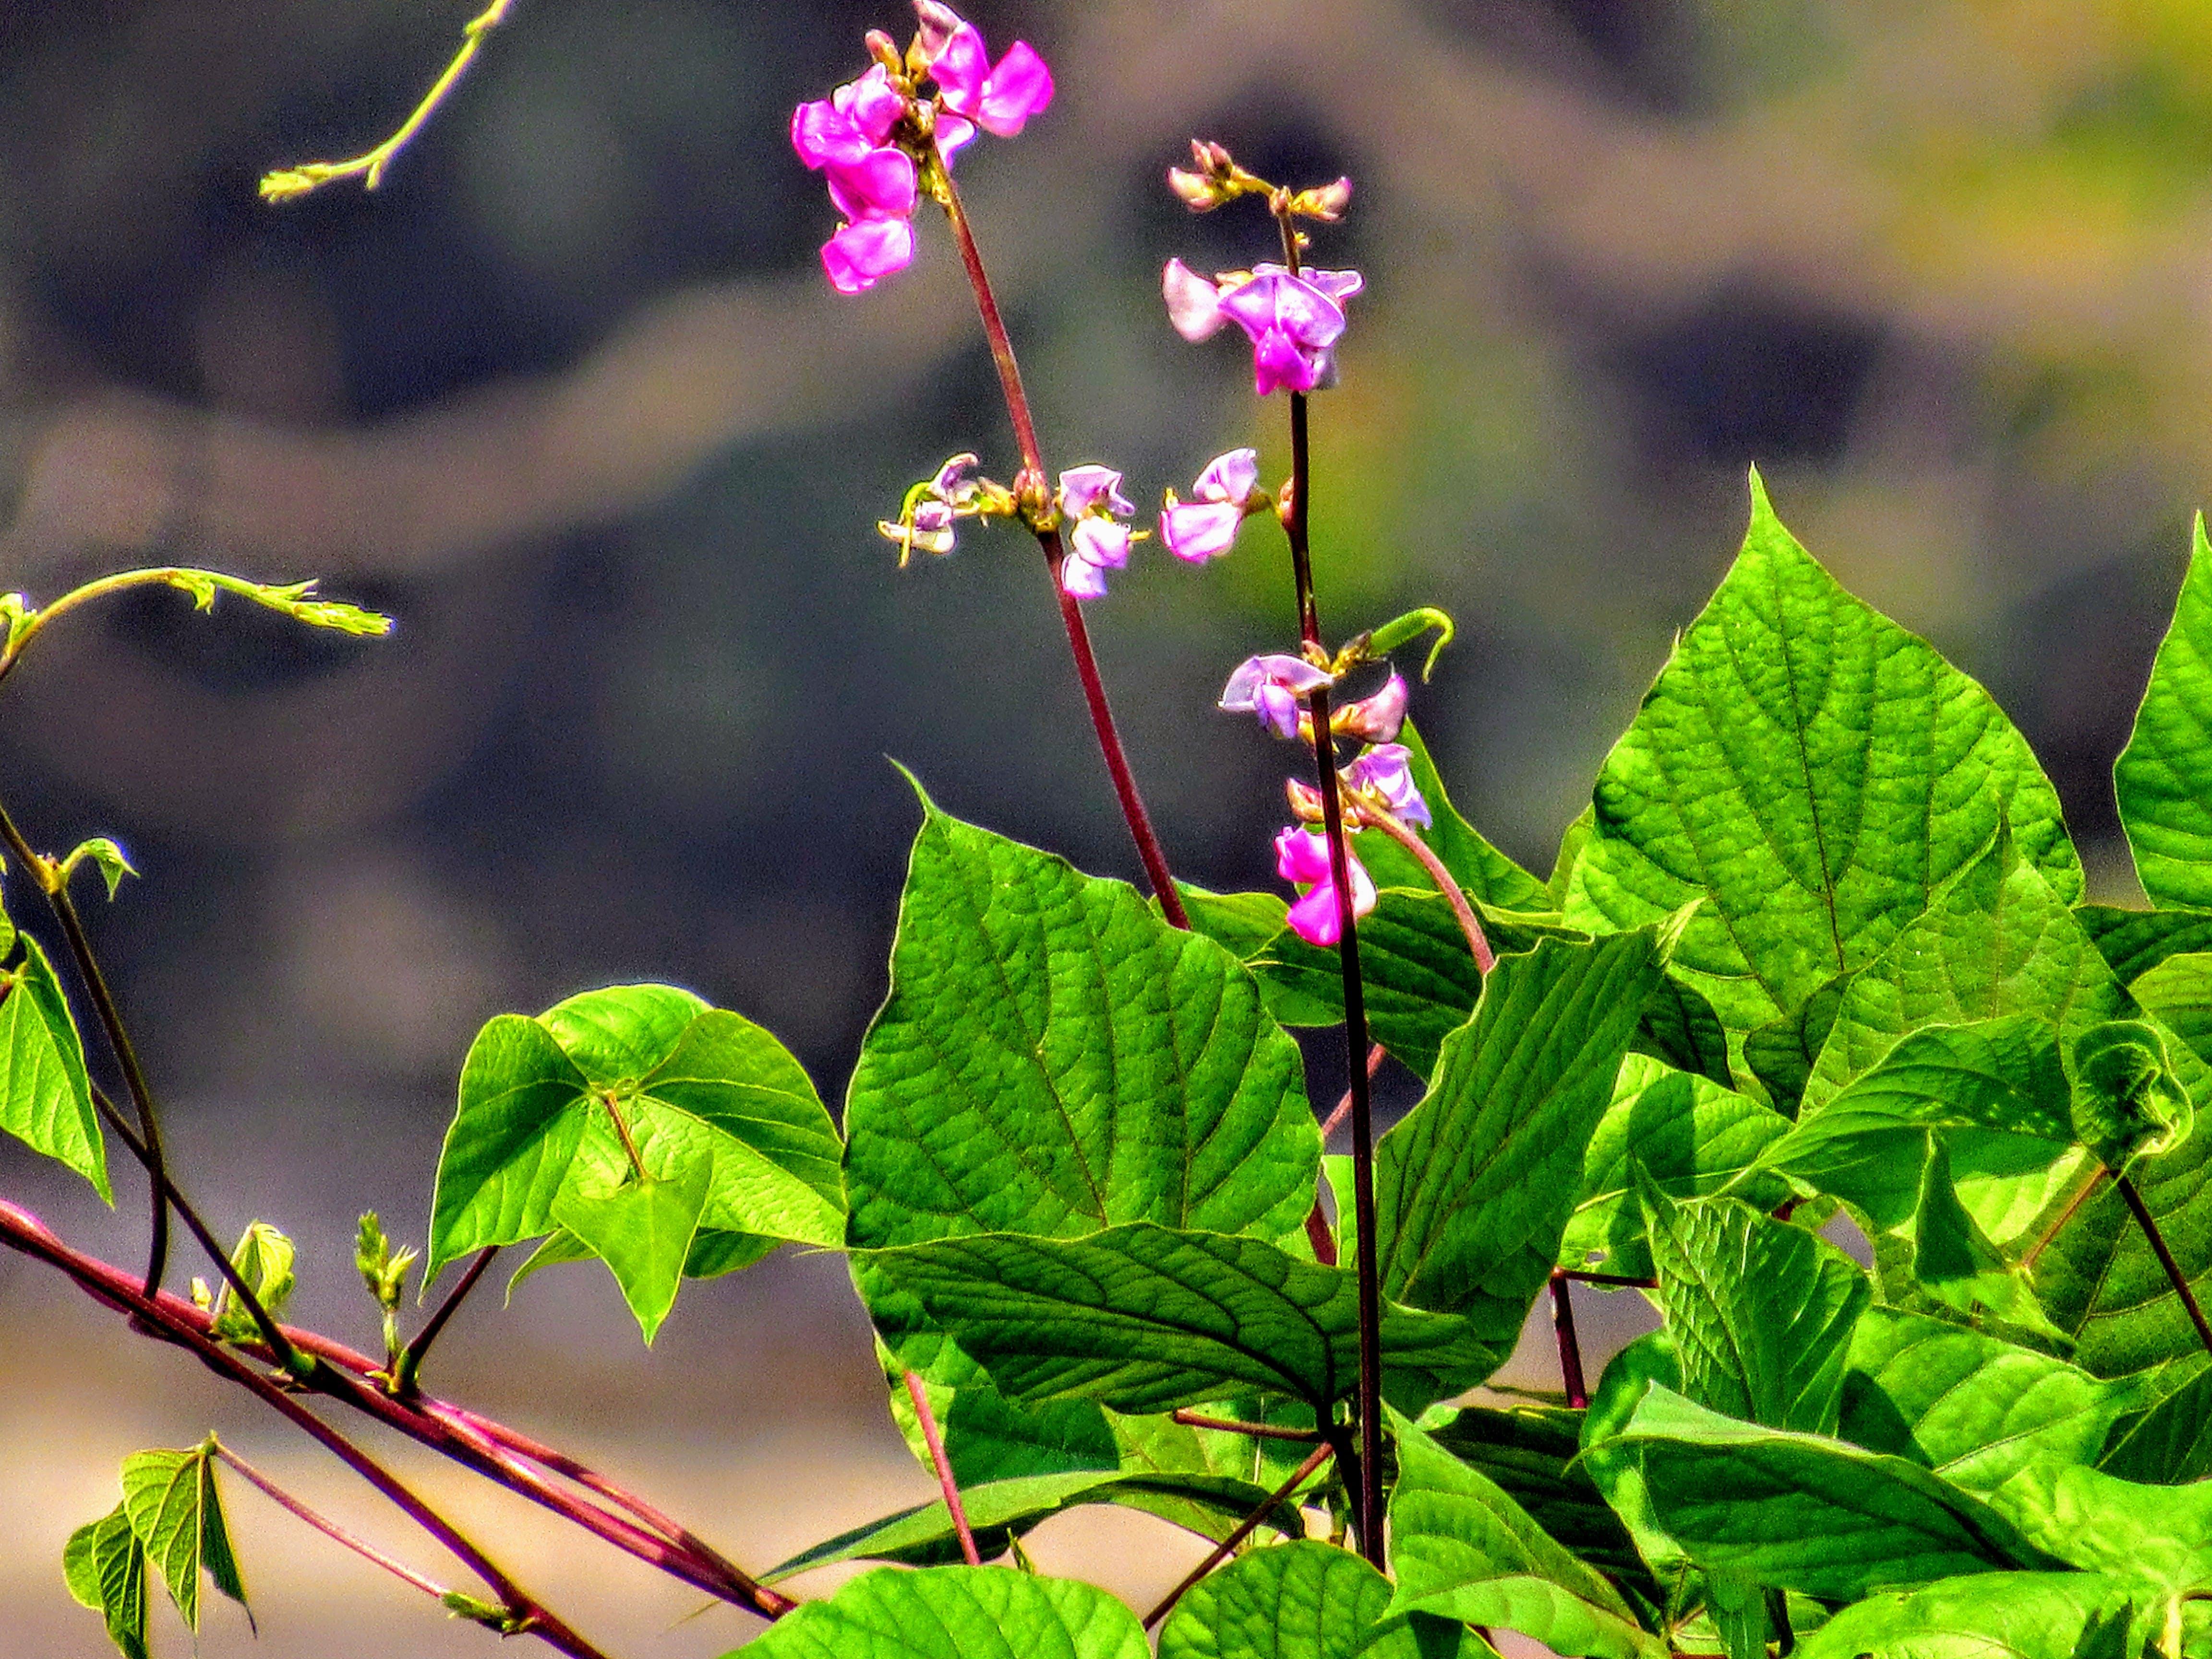 Free stock photo of #flowers